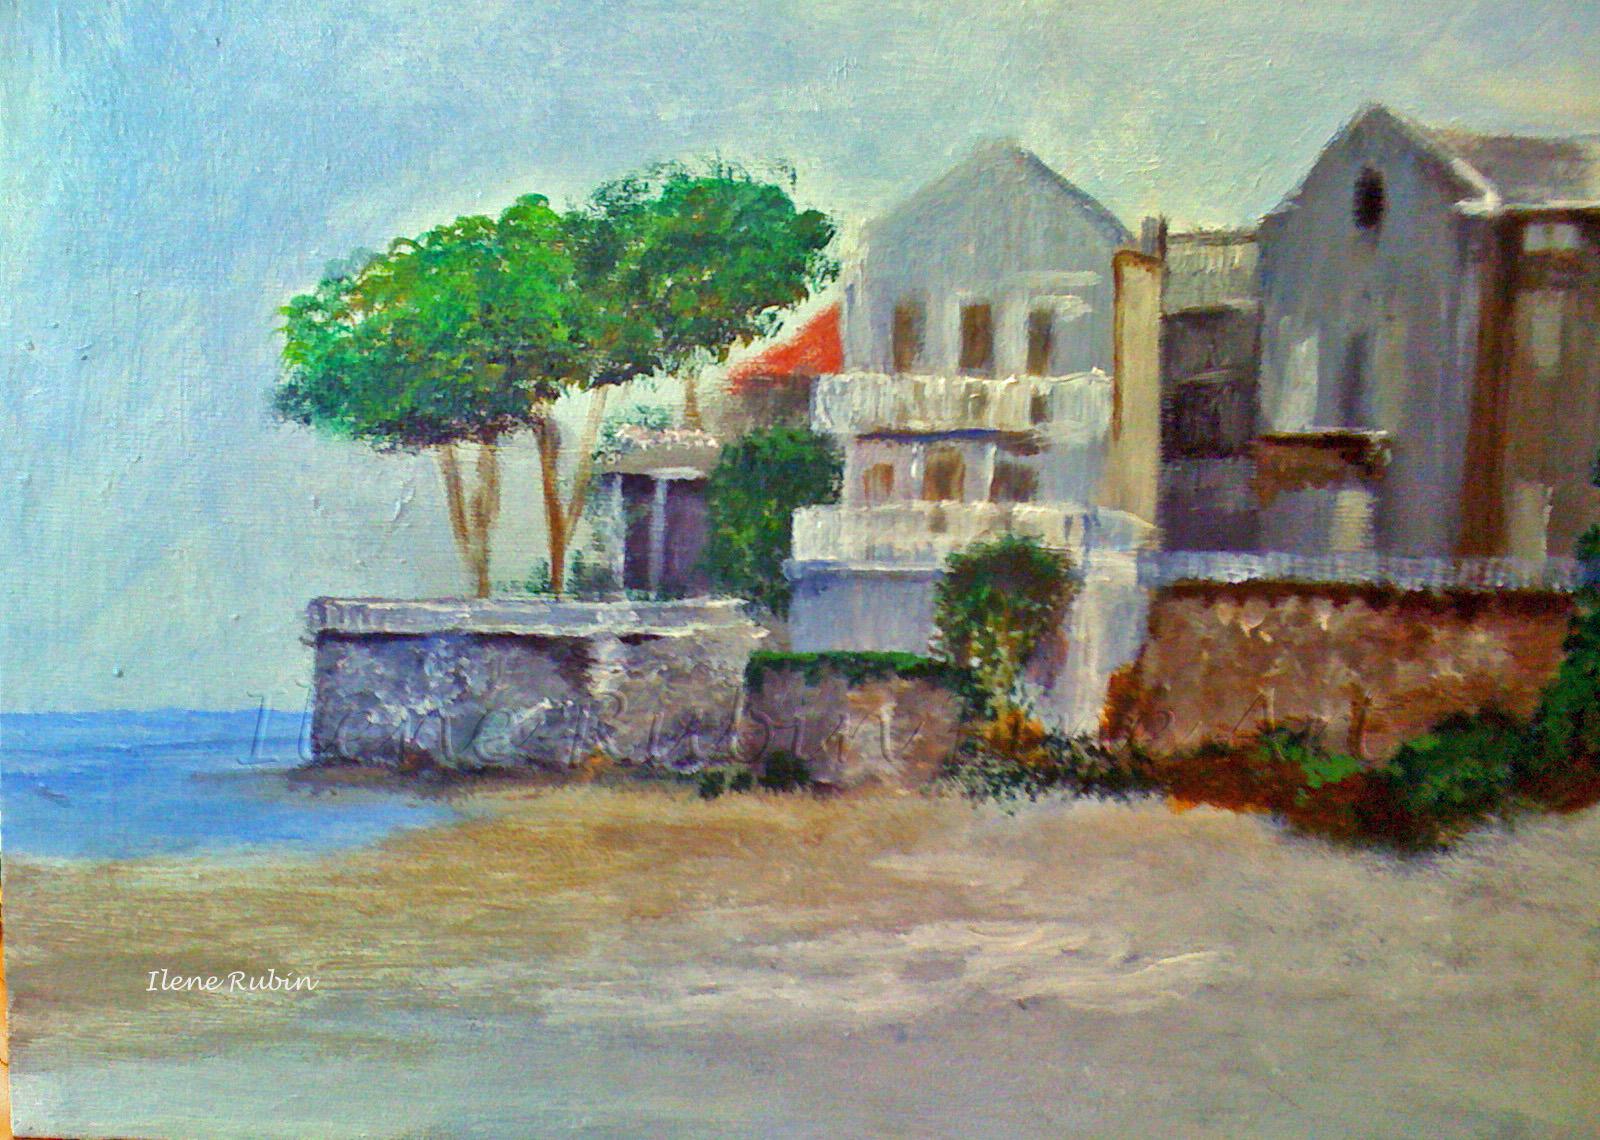 Ilene Rubin - acrylic painting